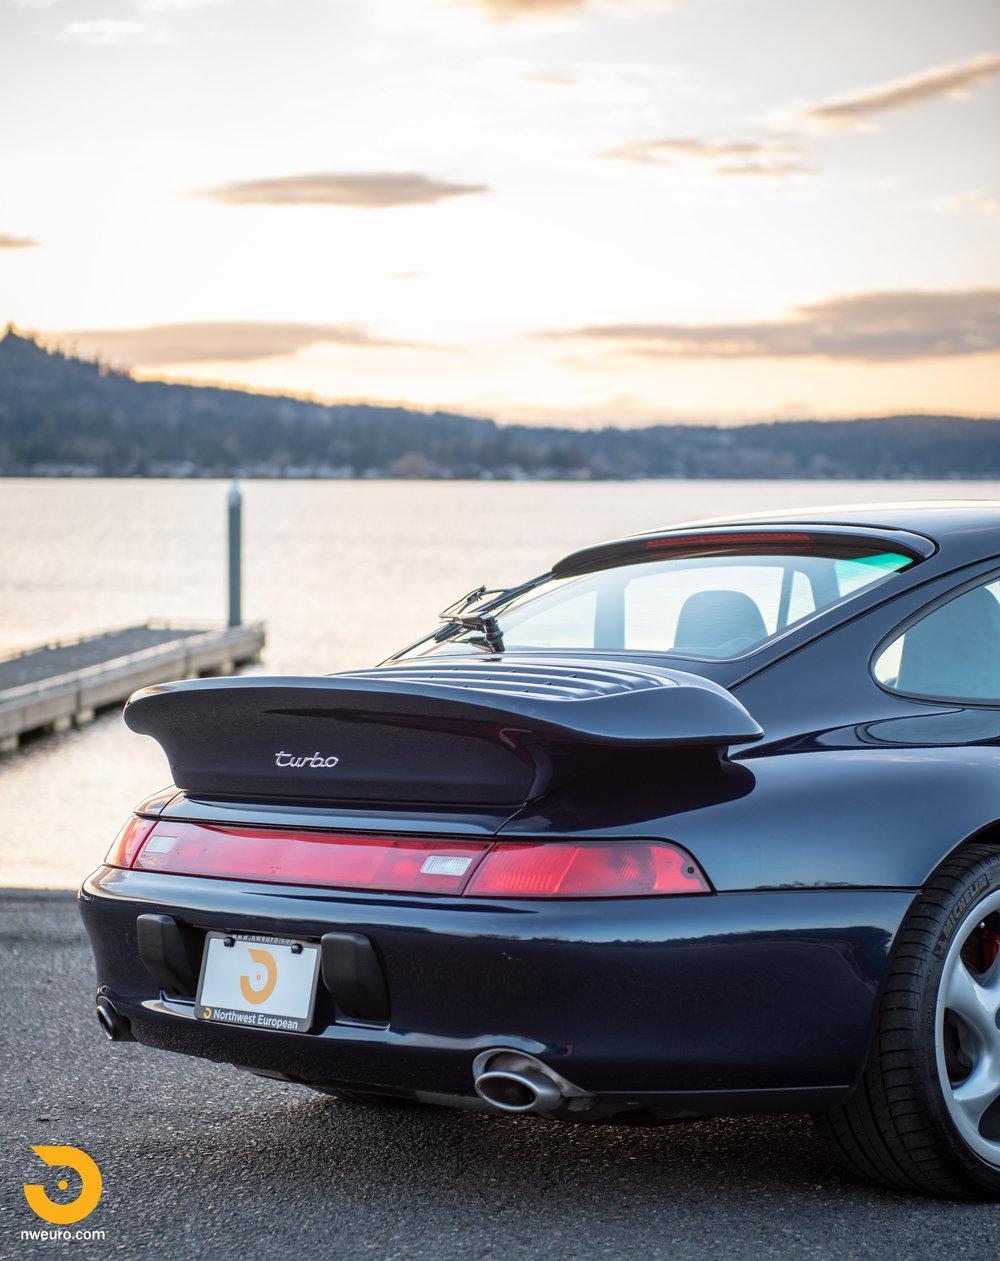 1997 Porsche 993 Turbo Ocean Blue-51.jpg